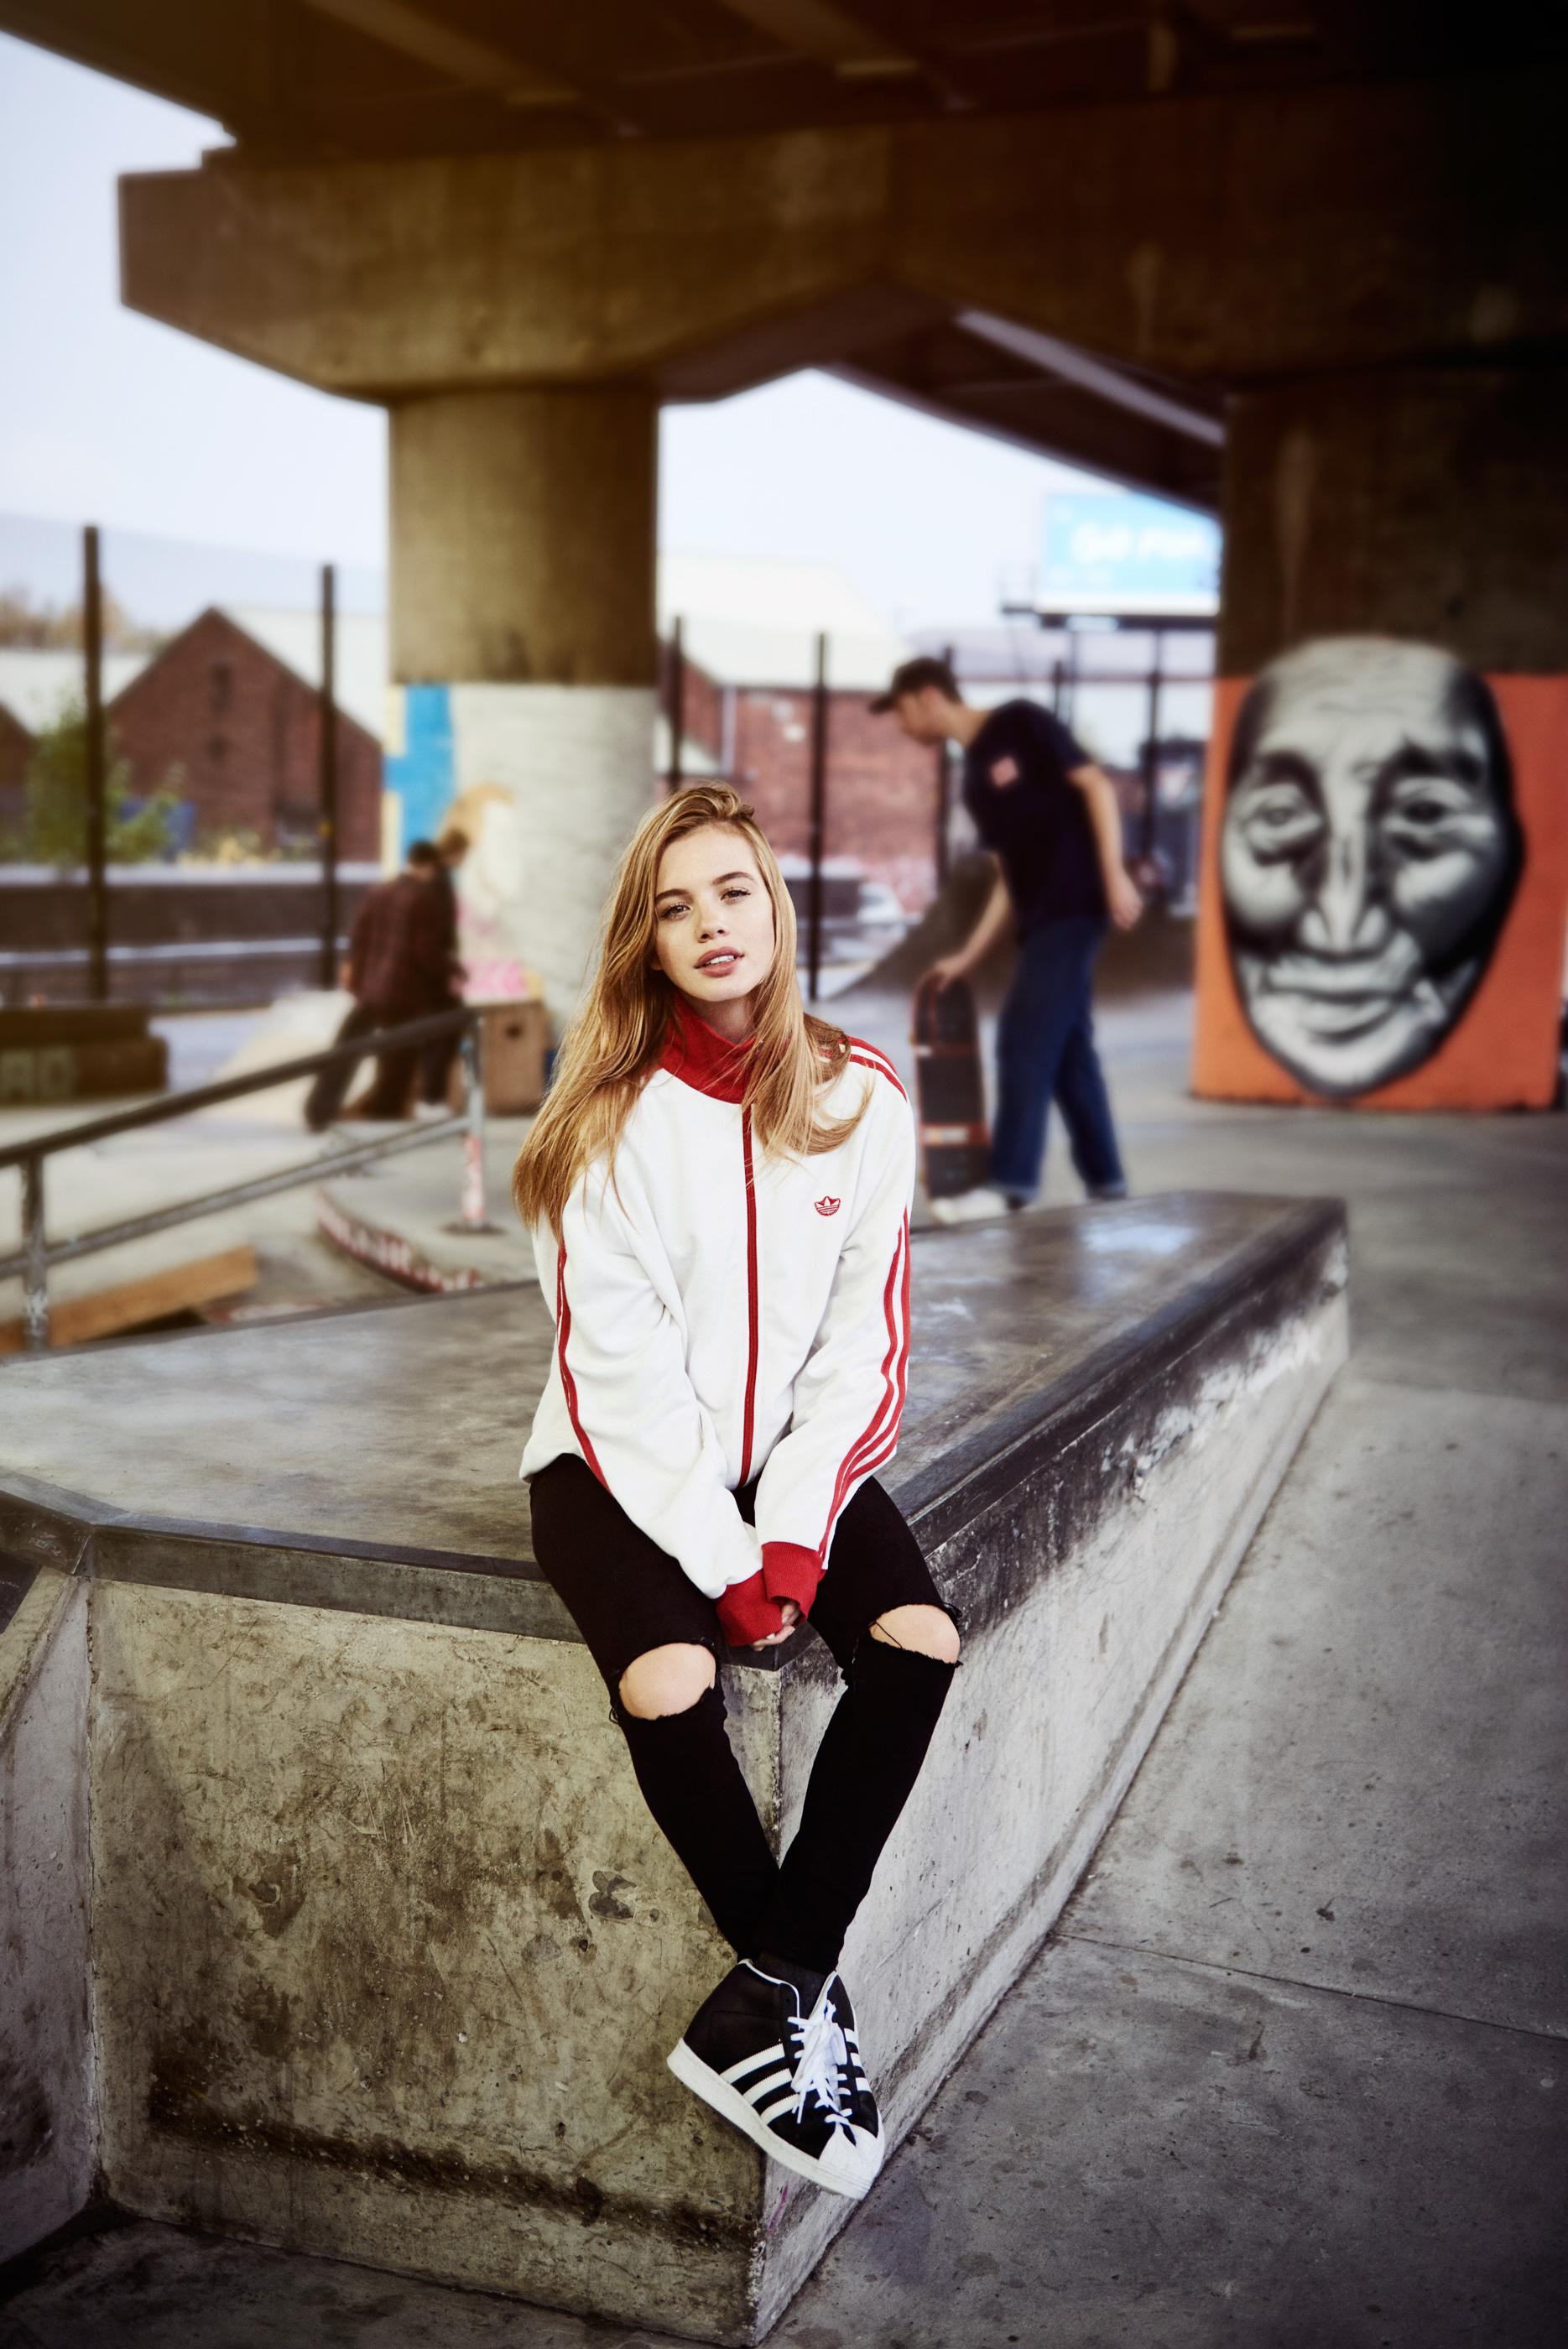 Matt-Stansfield-Photographer-portrait-stacey-hannant-streetwear-249